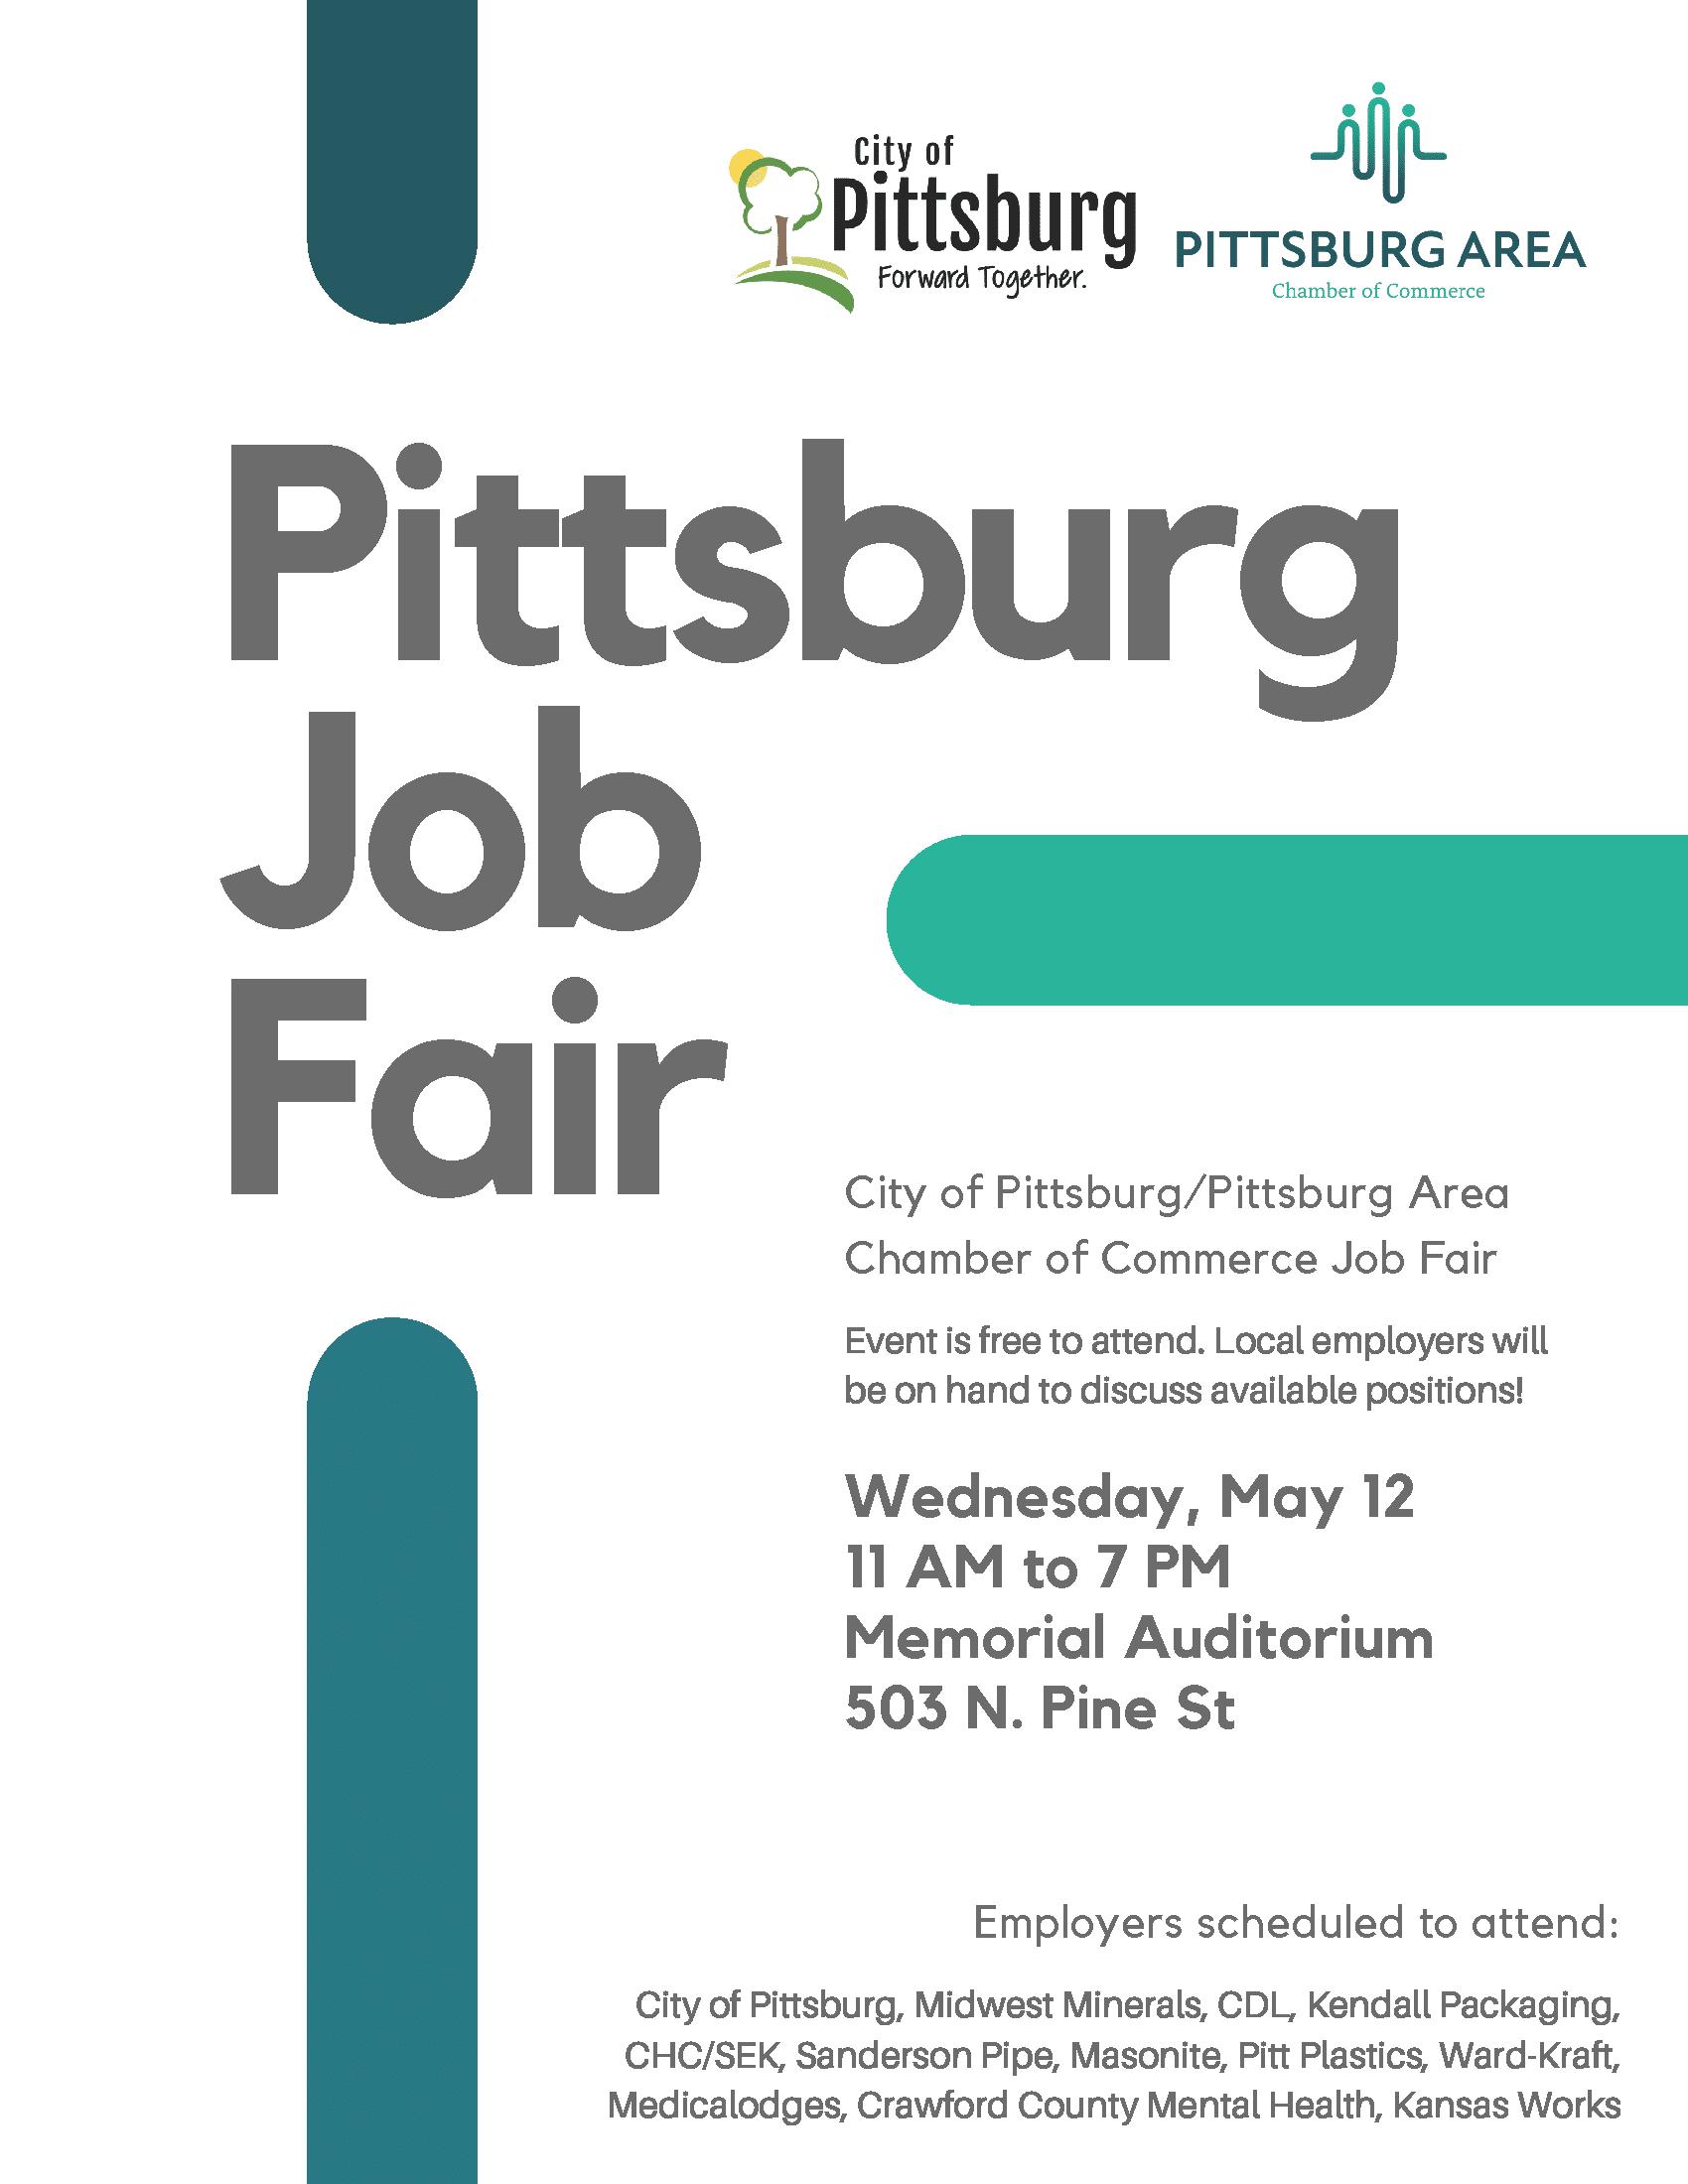 Pittsburg Job Fair